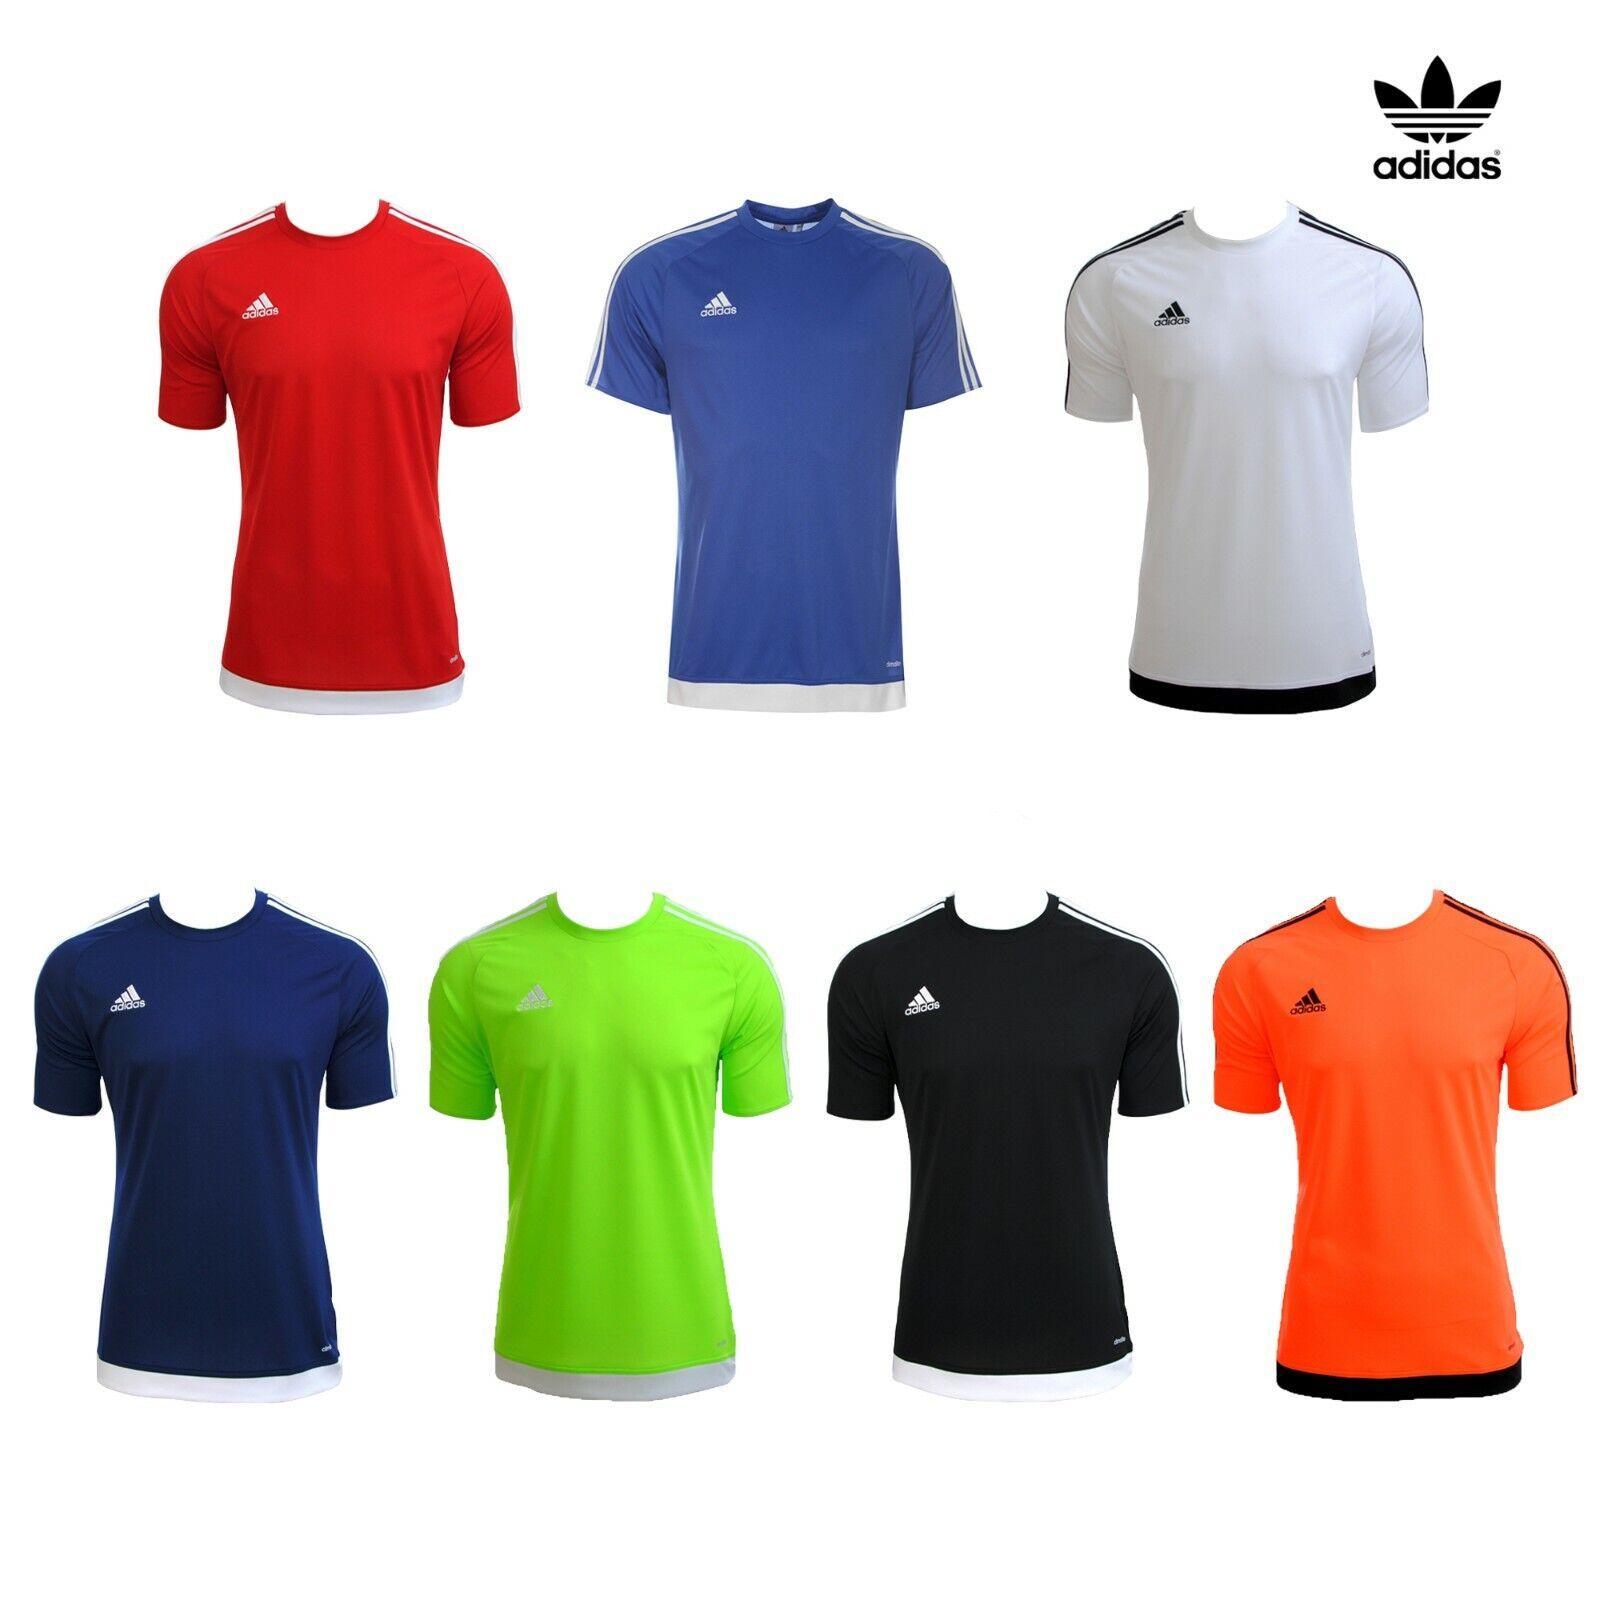 evitar Situación suma  Mens Adidas Estro 15 Climalite Short Sleeve T Shirt Top Football Size S M L  XL | eBay